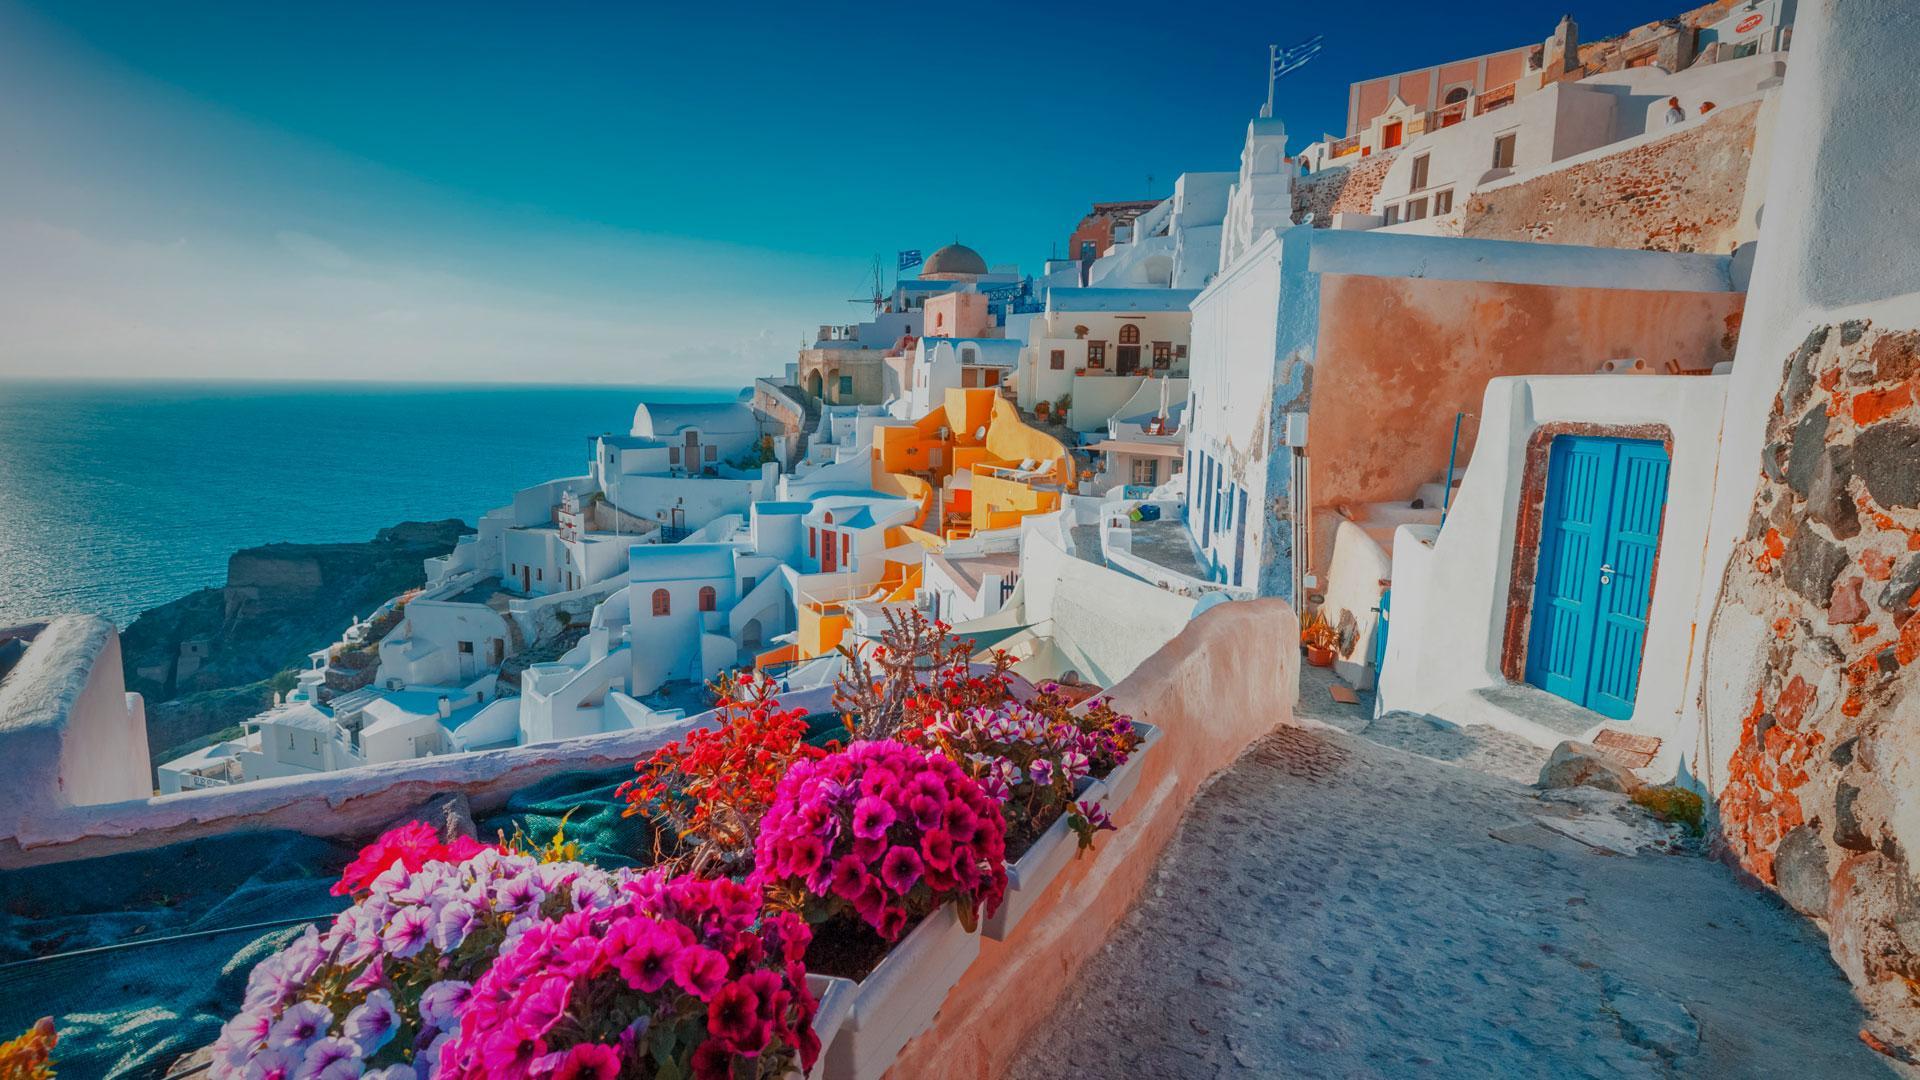 https://www.centraldevacaciones.com/viajes/assets/upload/d4924.jpg